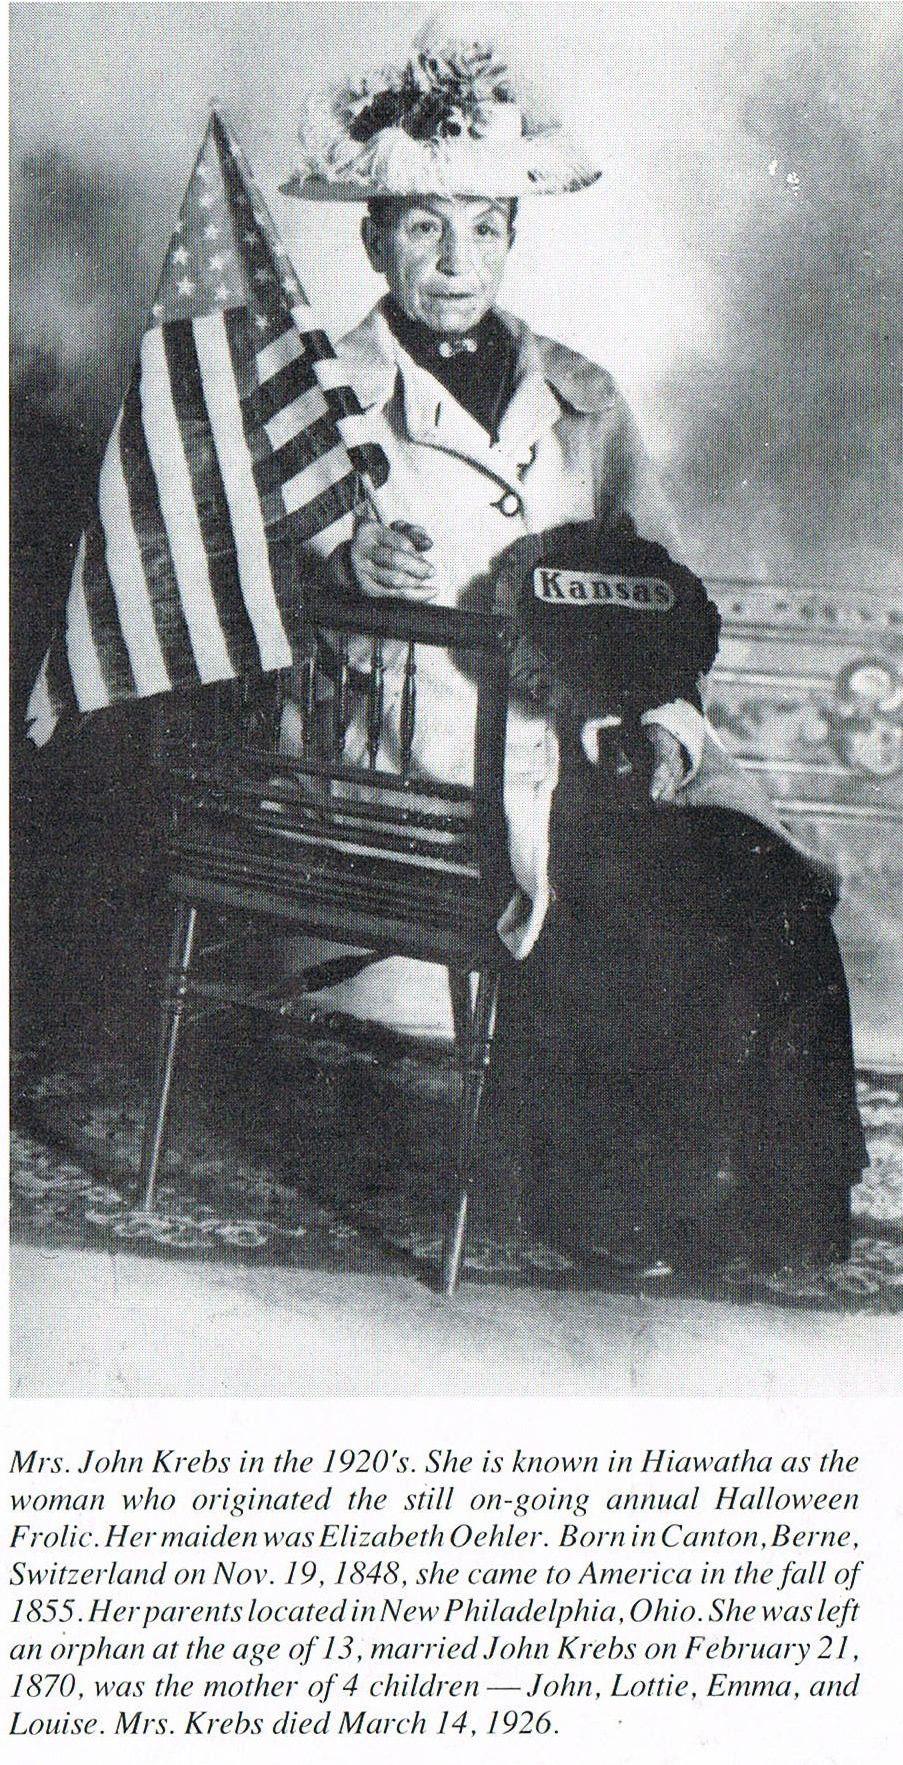 Mrs. John Krebs Founder of the Hiawatha Halloween Frolic (Parade) Hiawatha, Kansas